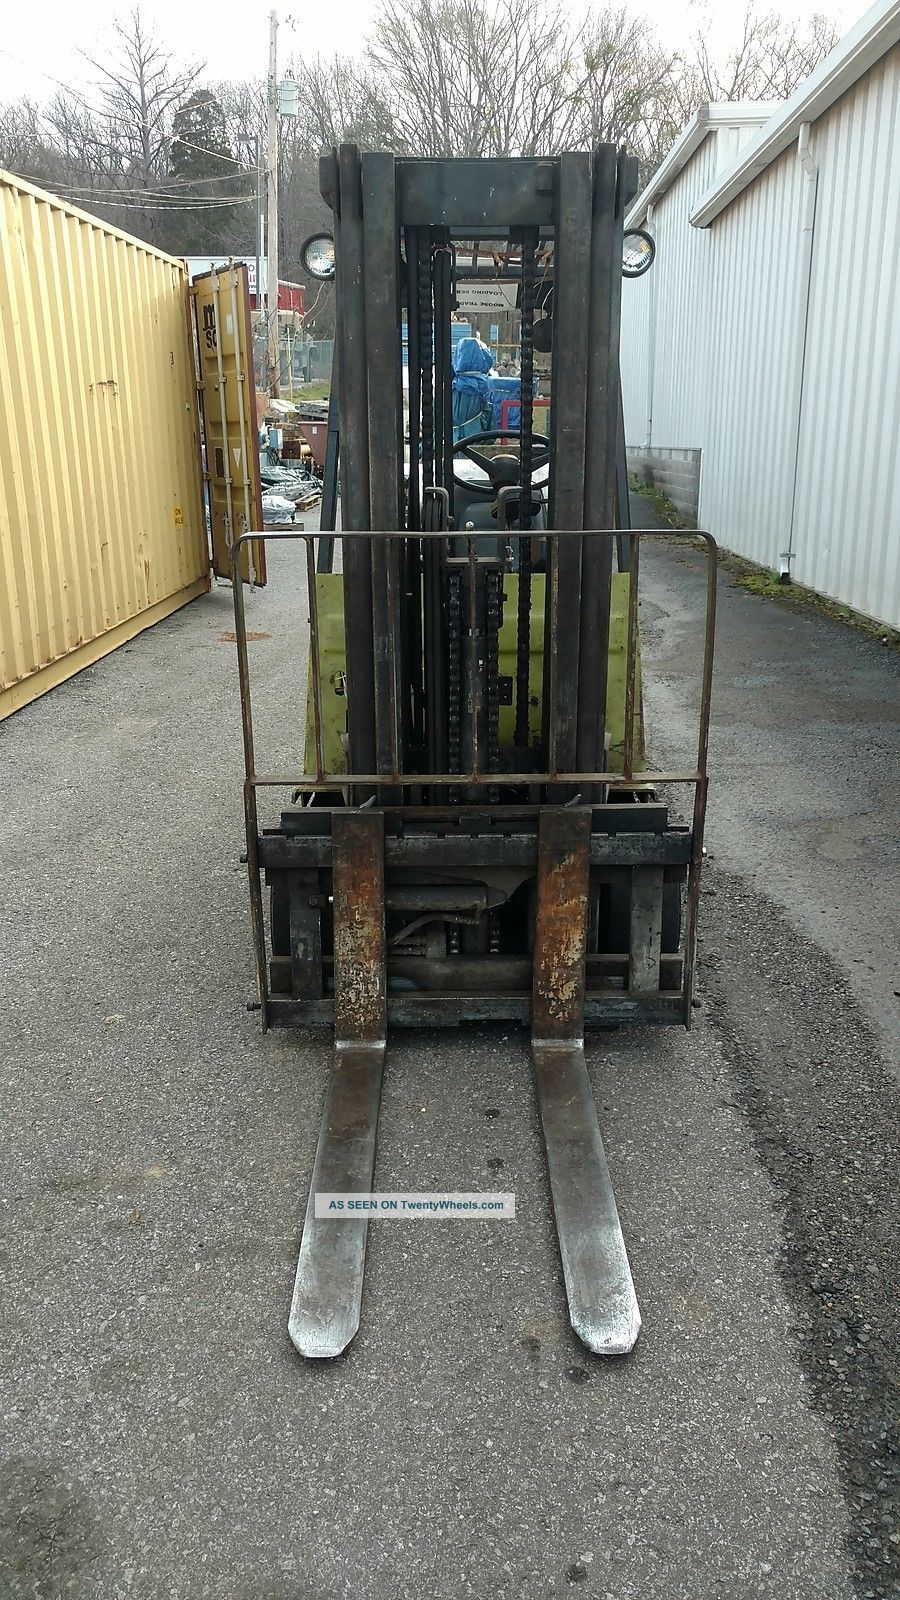 Clark Forklift Model Gcx30 4850lb Capacity Propane Forklifts photo